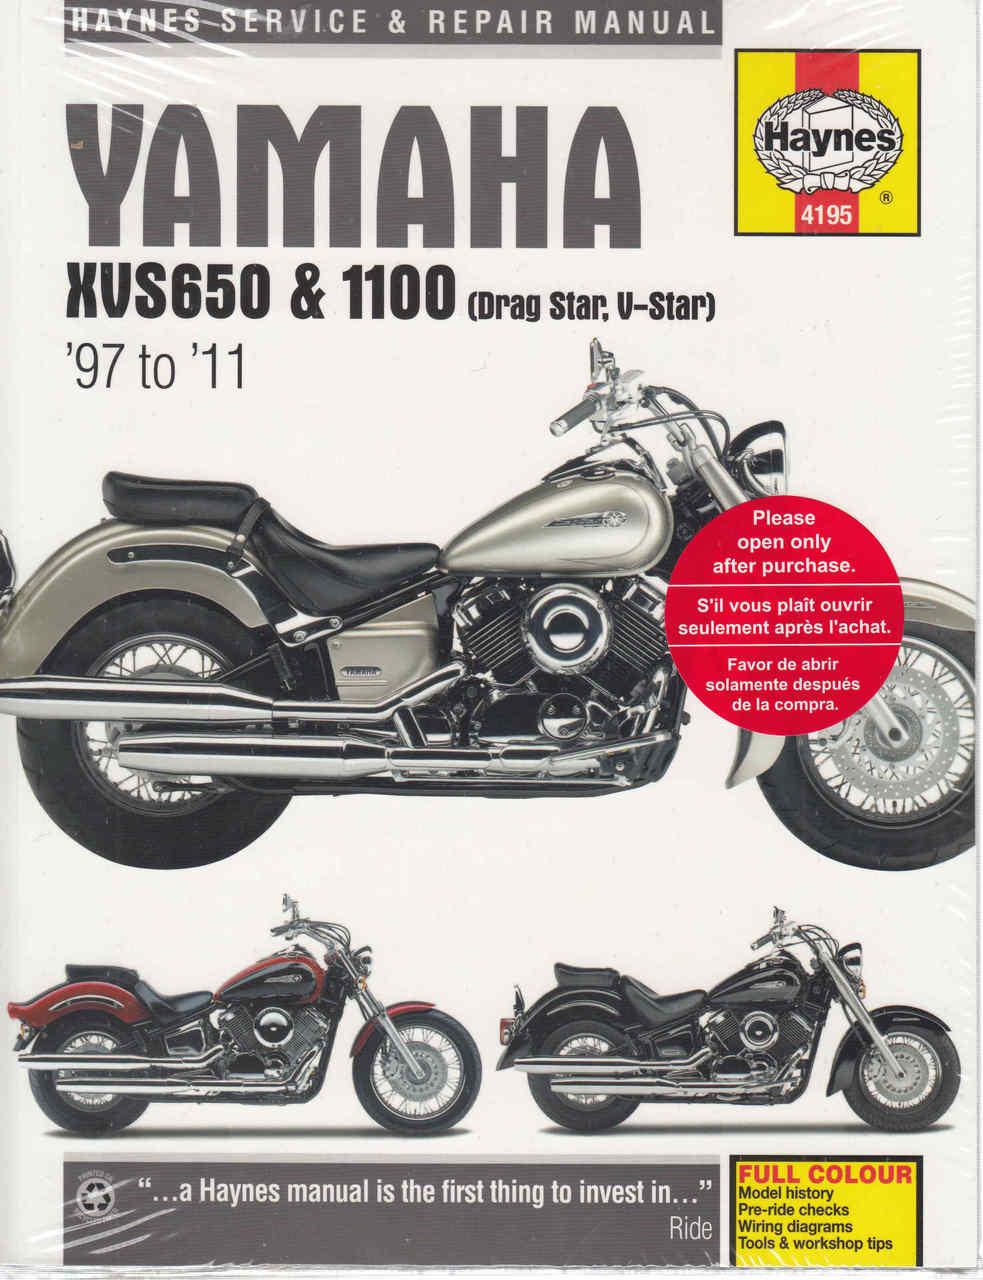 hight resolution of yamaha xvs650 and xvs1100 drag star v star 1997 2011 workshop manual